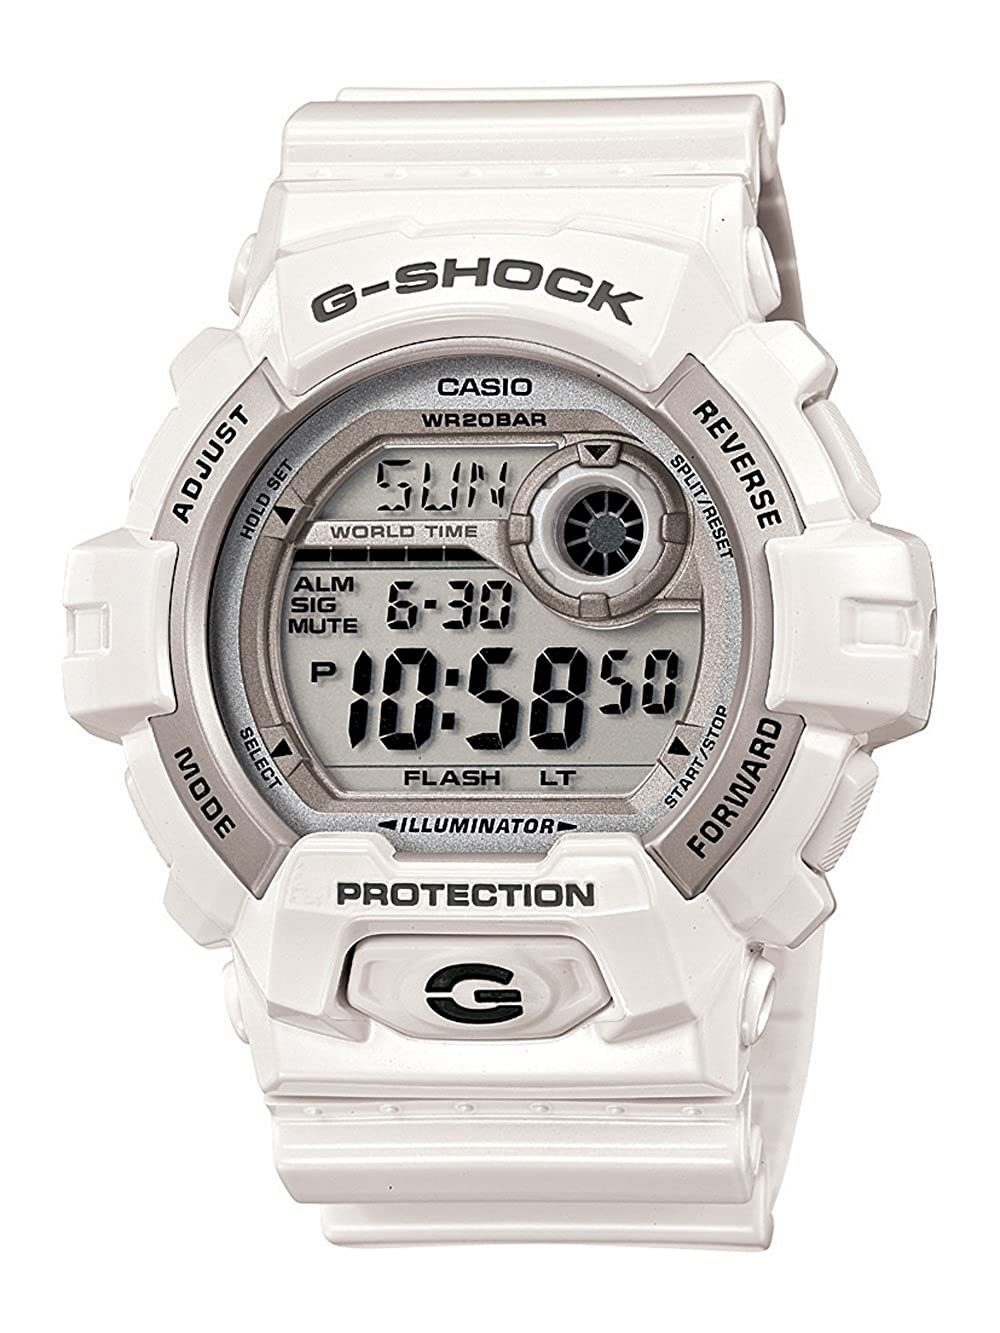 : Casio Men's G8900A 7CR G Shock Shock Resistant